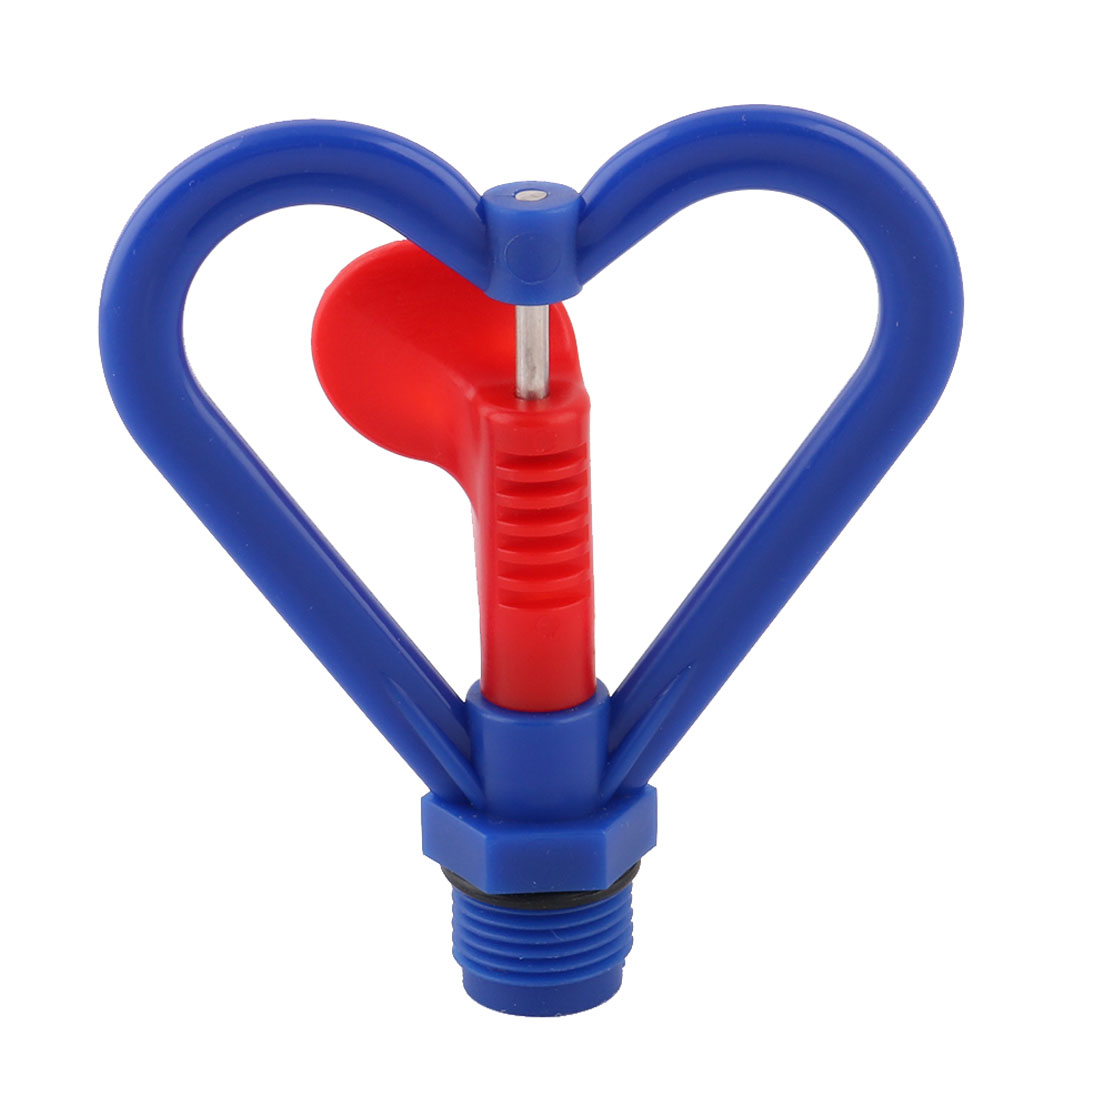 Garden Plastic Heart Shaped Plants Irrigation Water Sprayer Sprinkler Head Blue